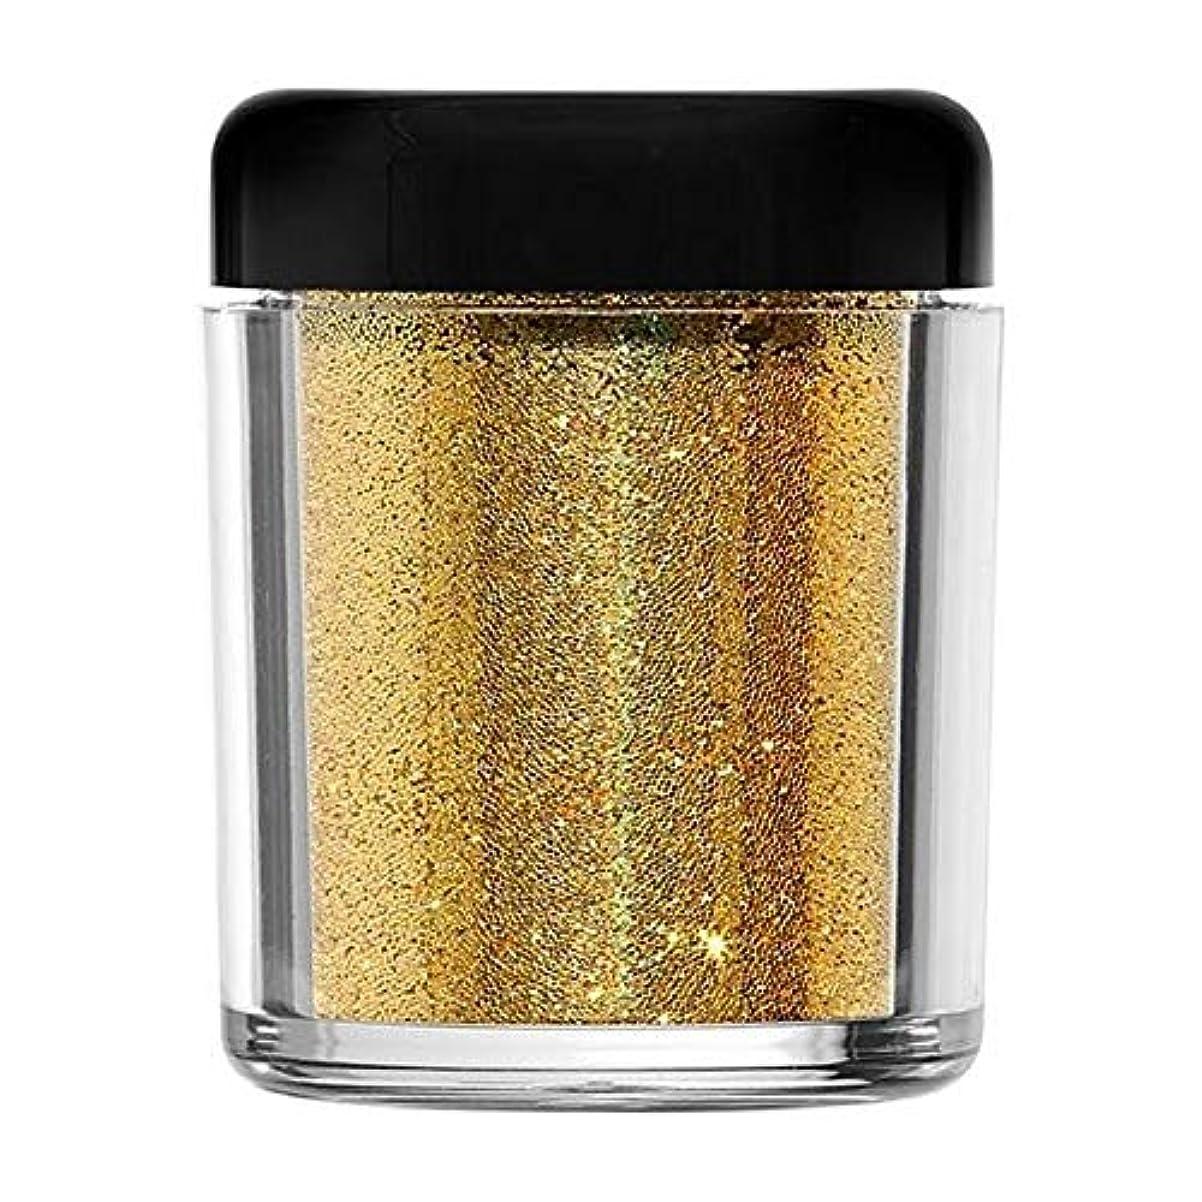 [Barry M ] バリーメートルのグリッターラッシュボディの輝き - 火の玉 - Barry M Glitter Rush Body Glitter - Fireball [並行輸入品]